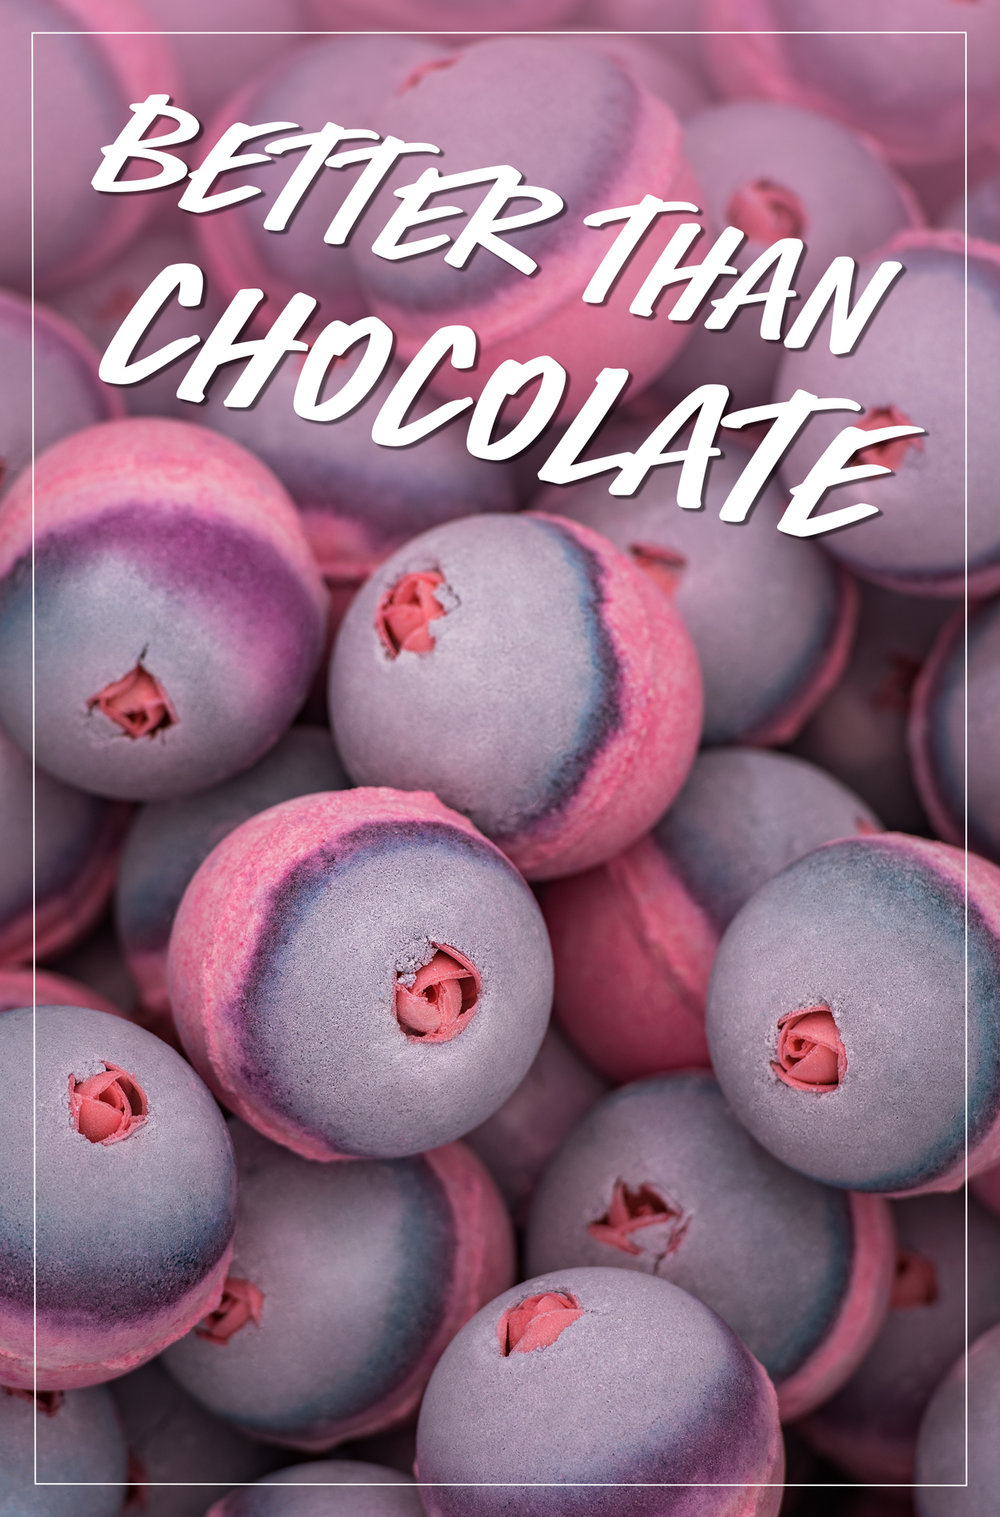 LUSH Better than chocolate-1.jpg